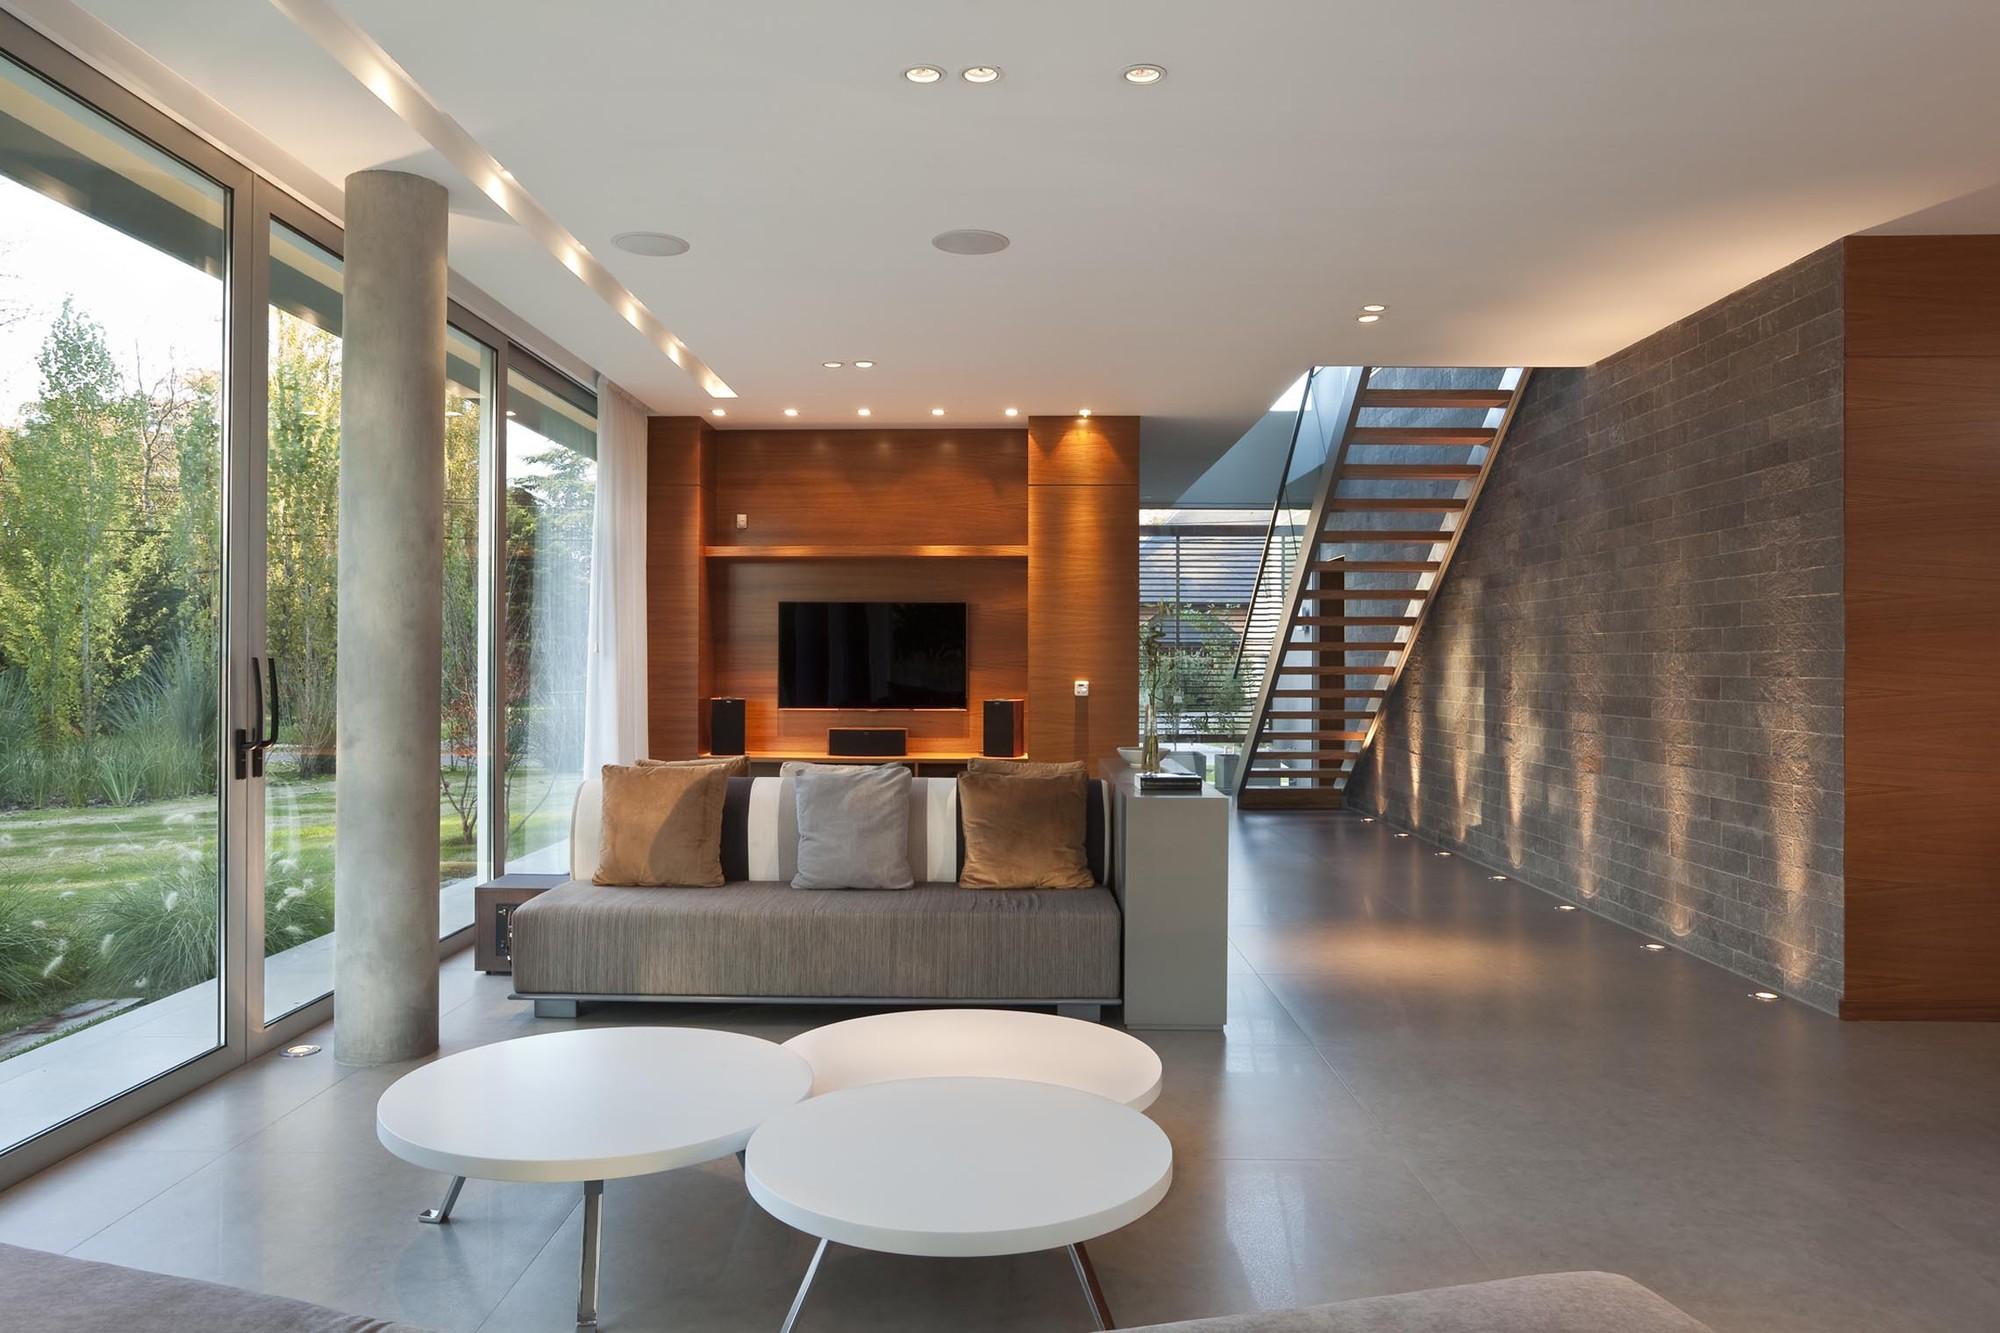 Gallery of house in pilar estudio parysow schargrodsky - Arquitectos de interiores famosos ...